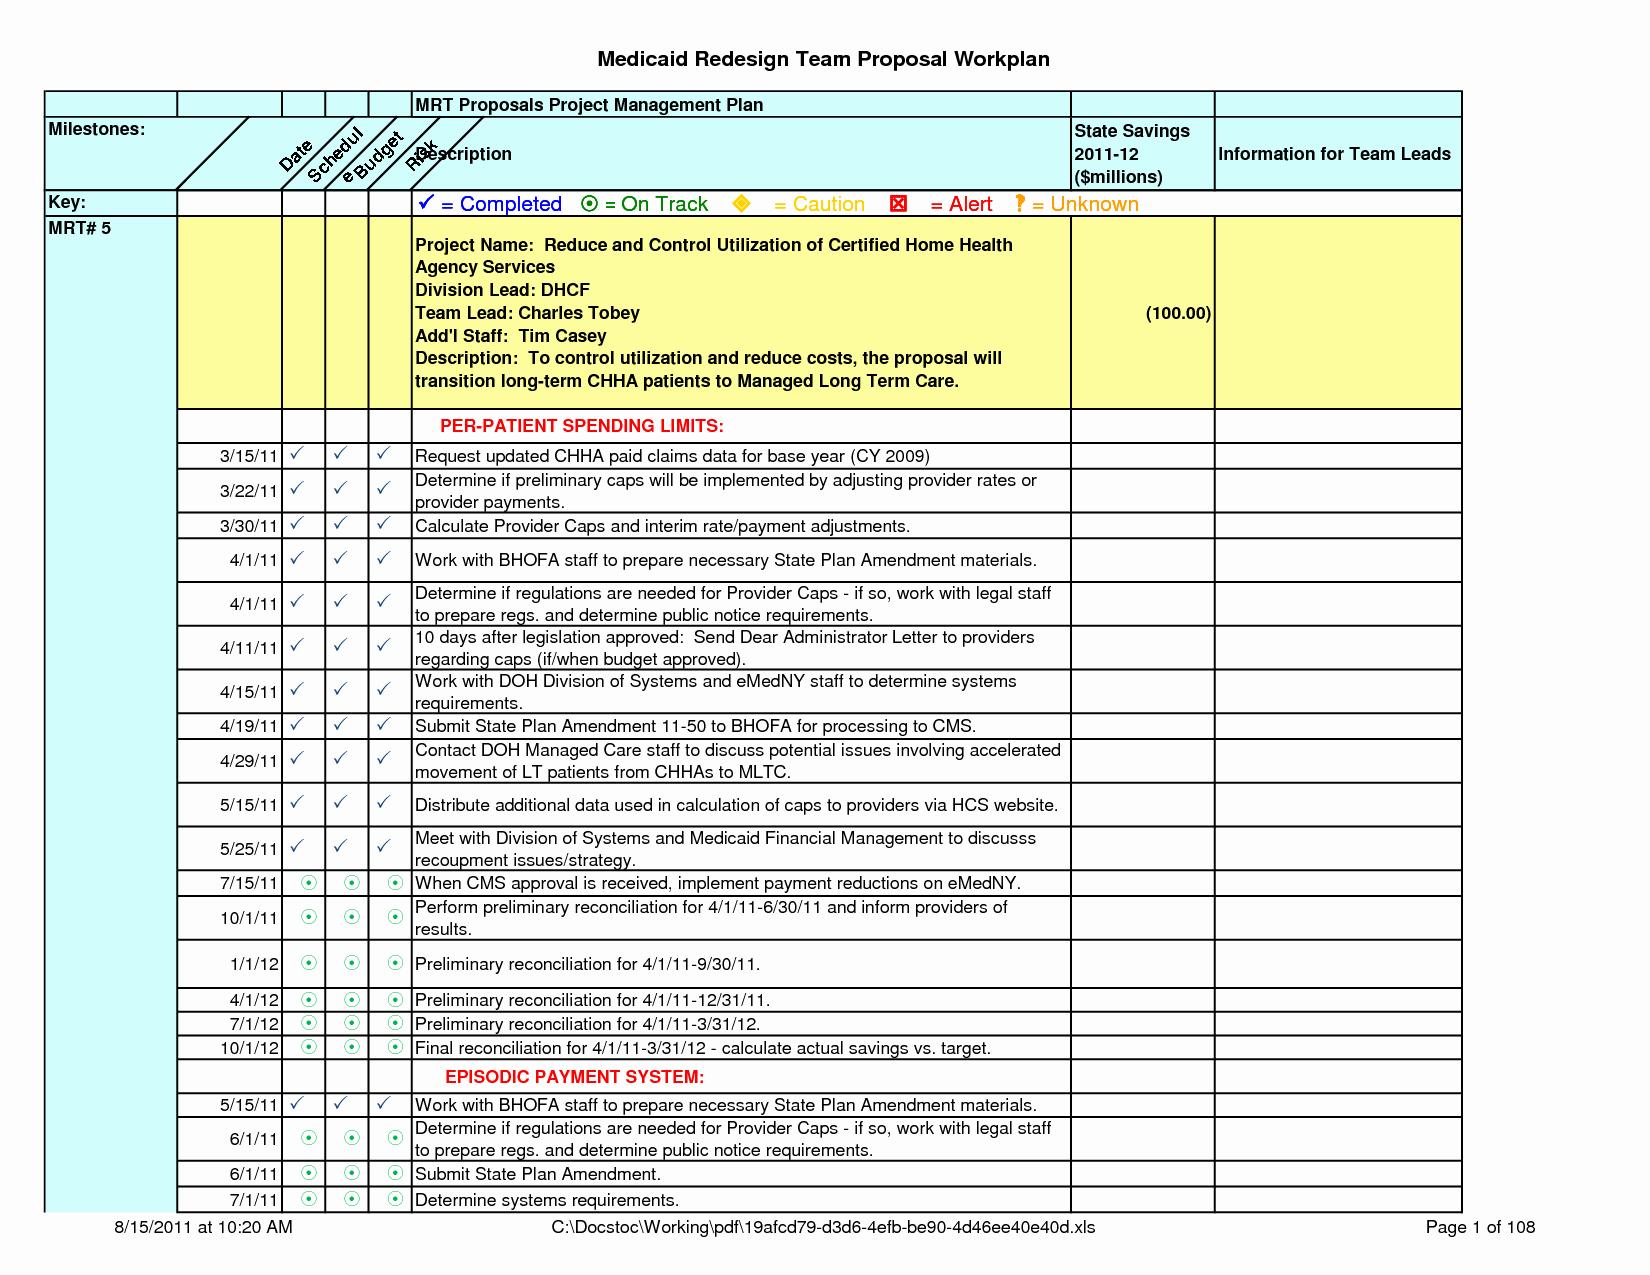 Recruitment Action Plan Template Unique Recruitment forms and Templates